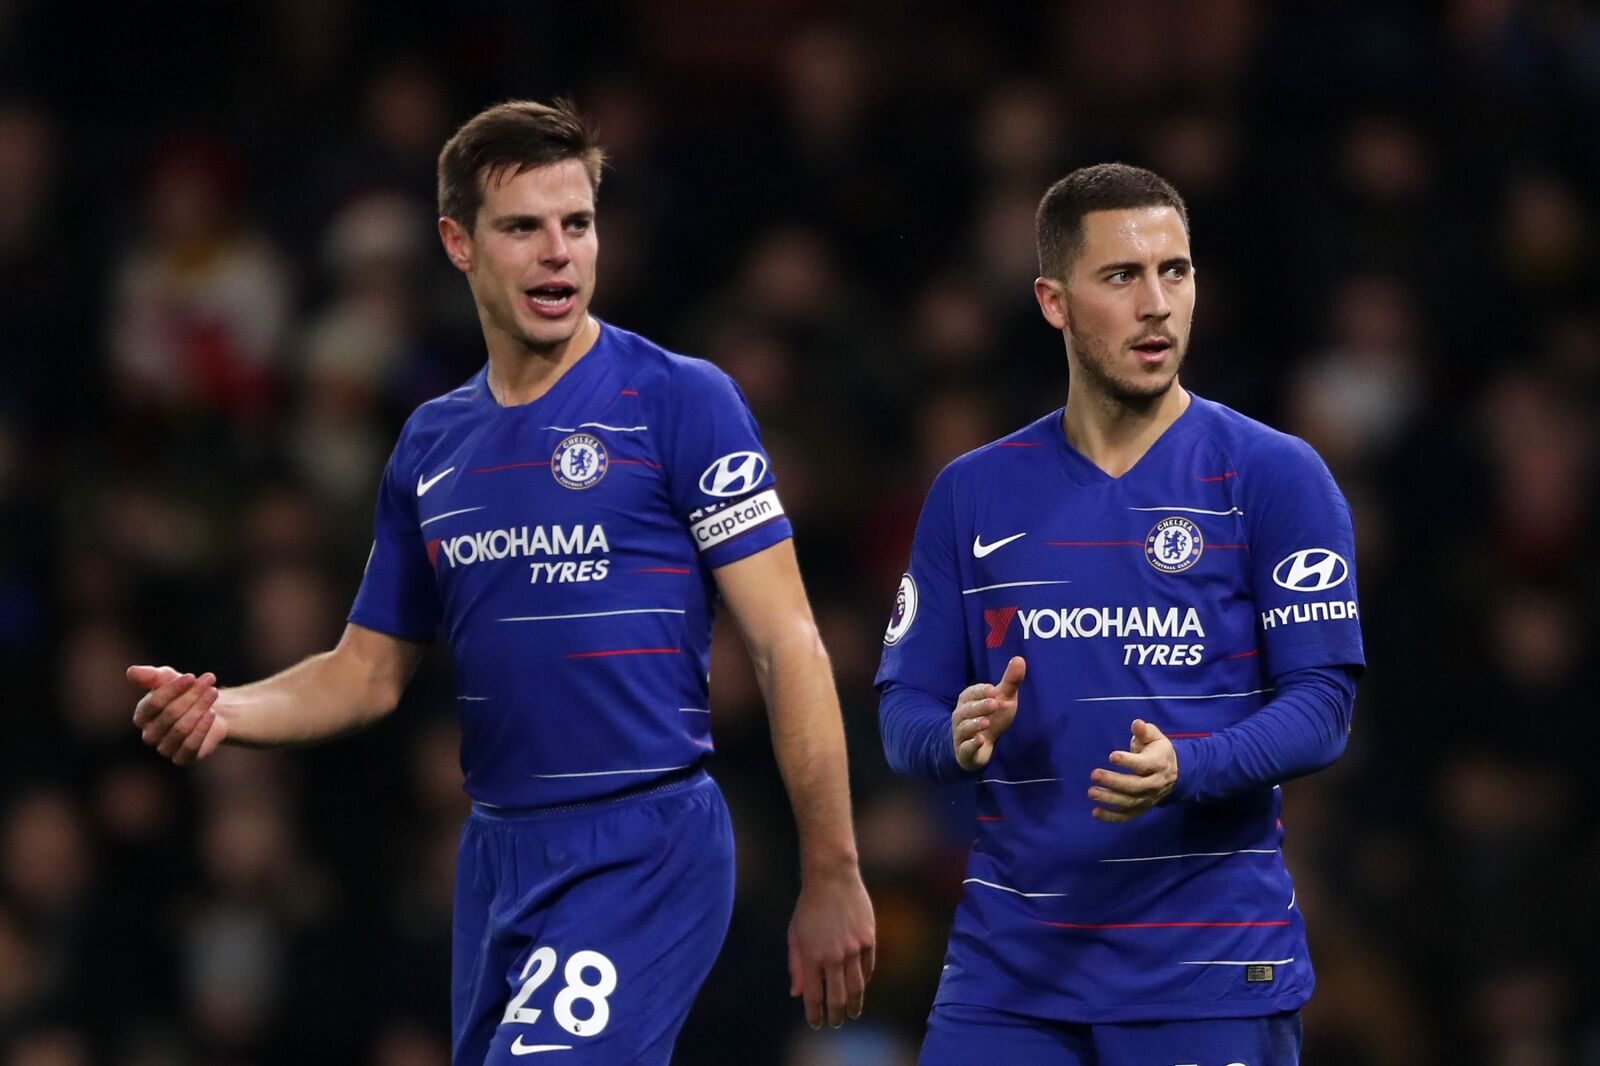 Chelsea's no ban plan shows the club has no long term vision